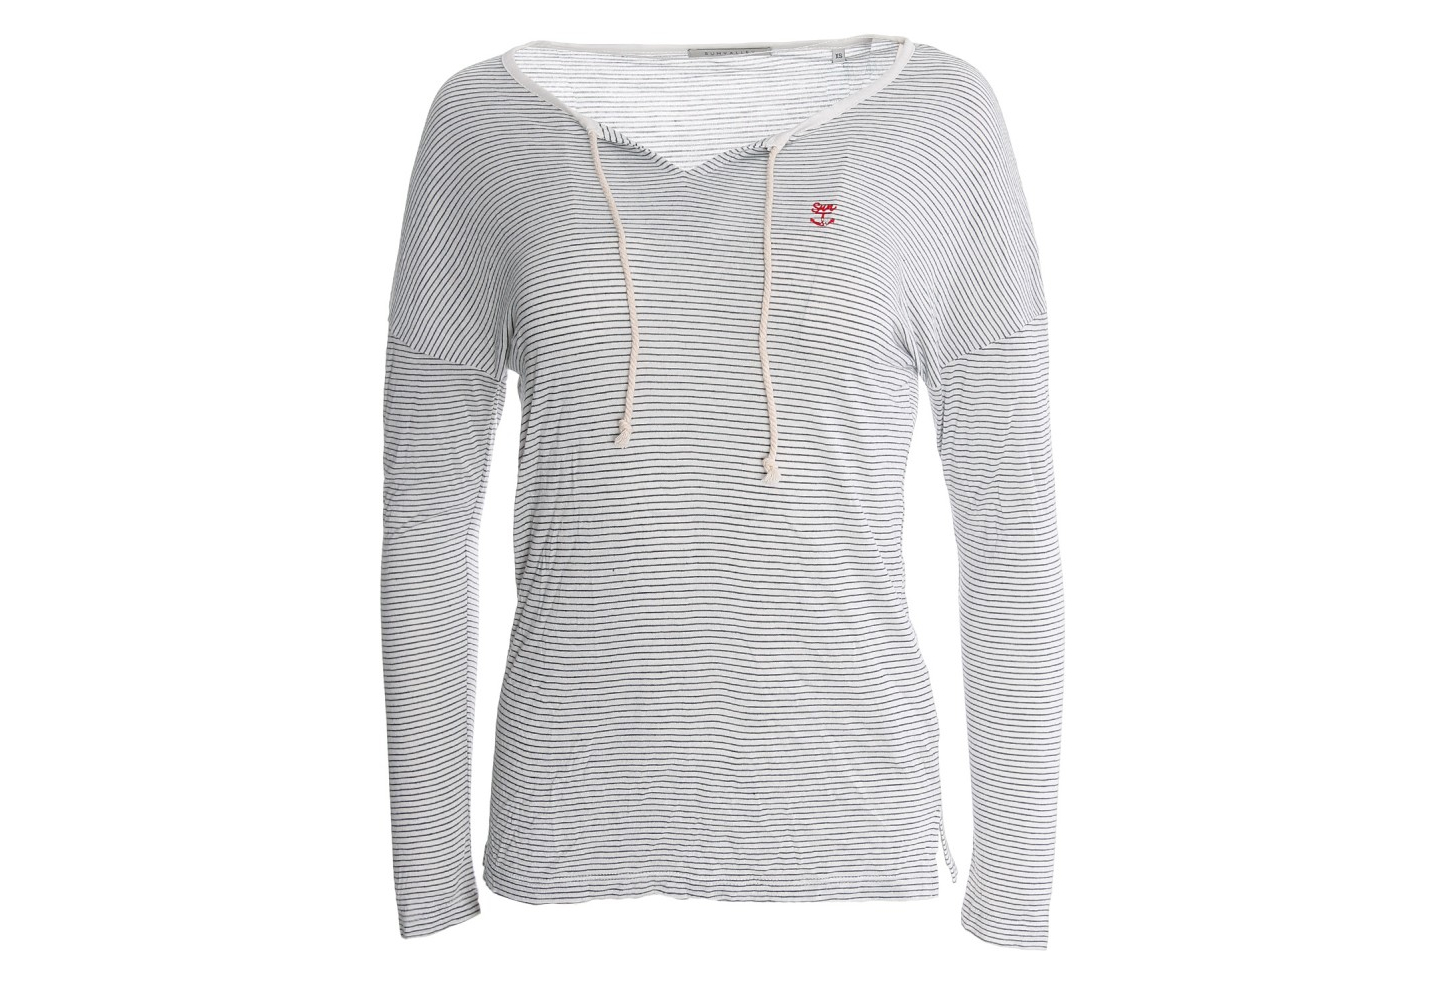 Tee Shirt Blanc Femme Sun Valley Amqui